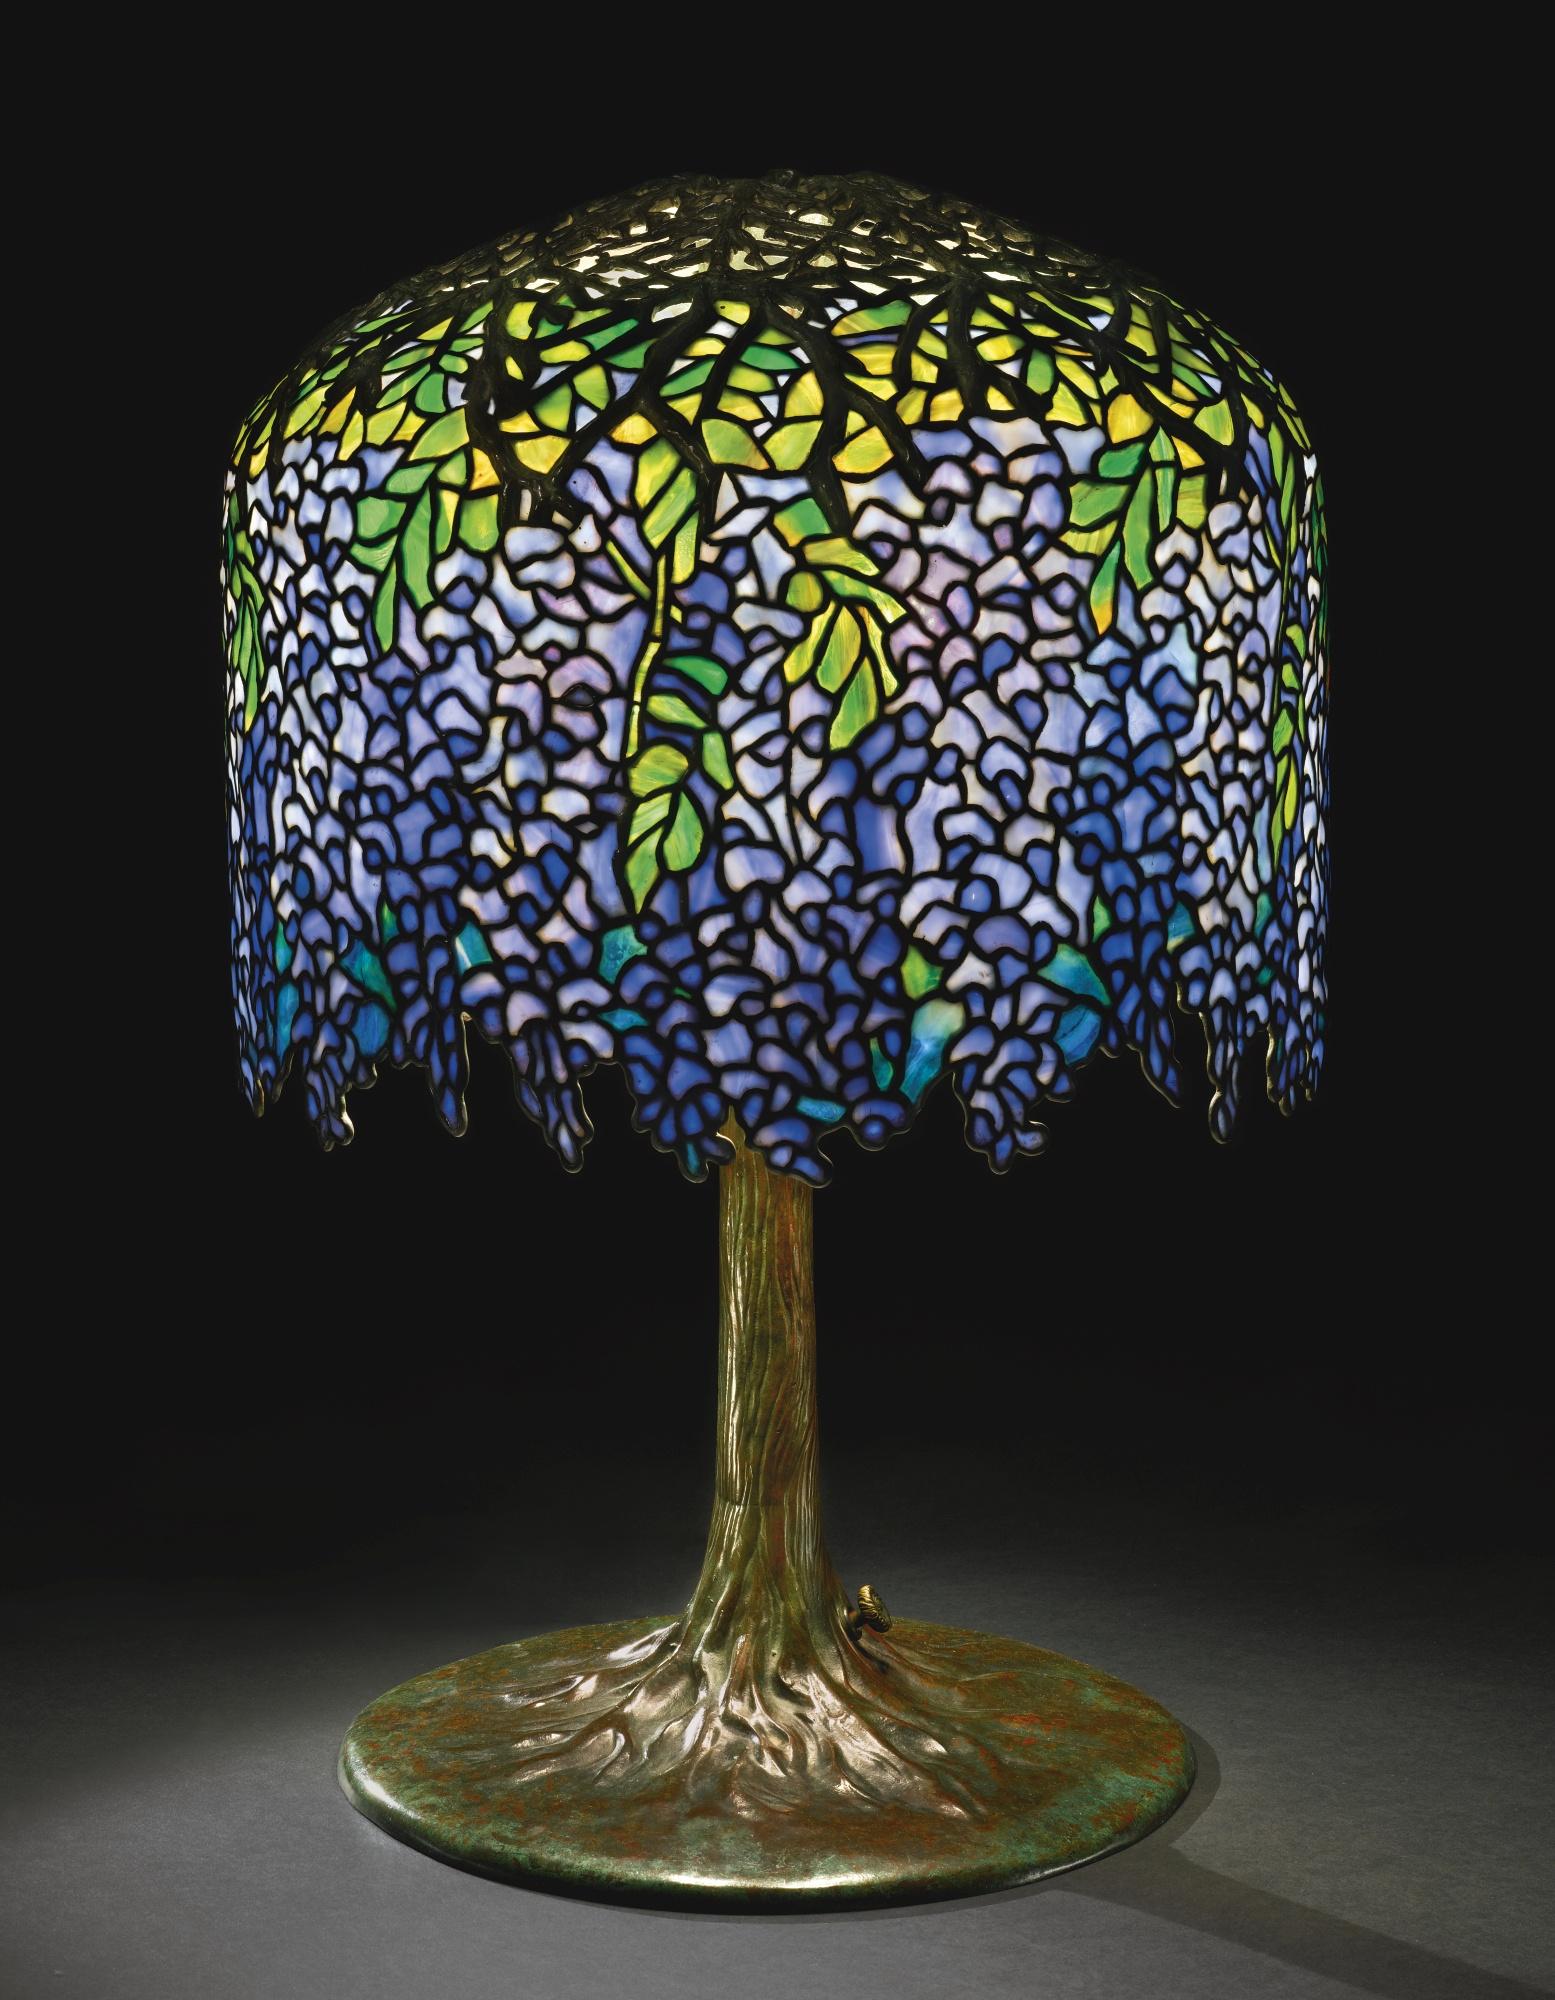 Tiffany Studios Wisteria table lamp, Sotheby's lot #330